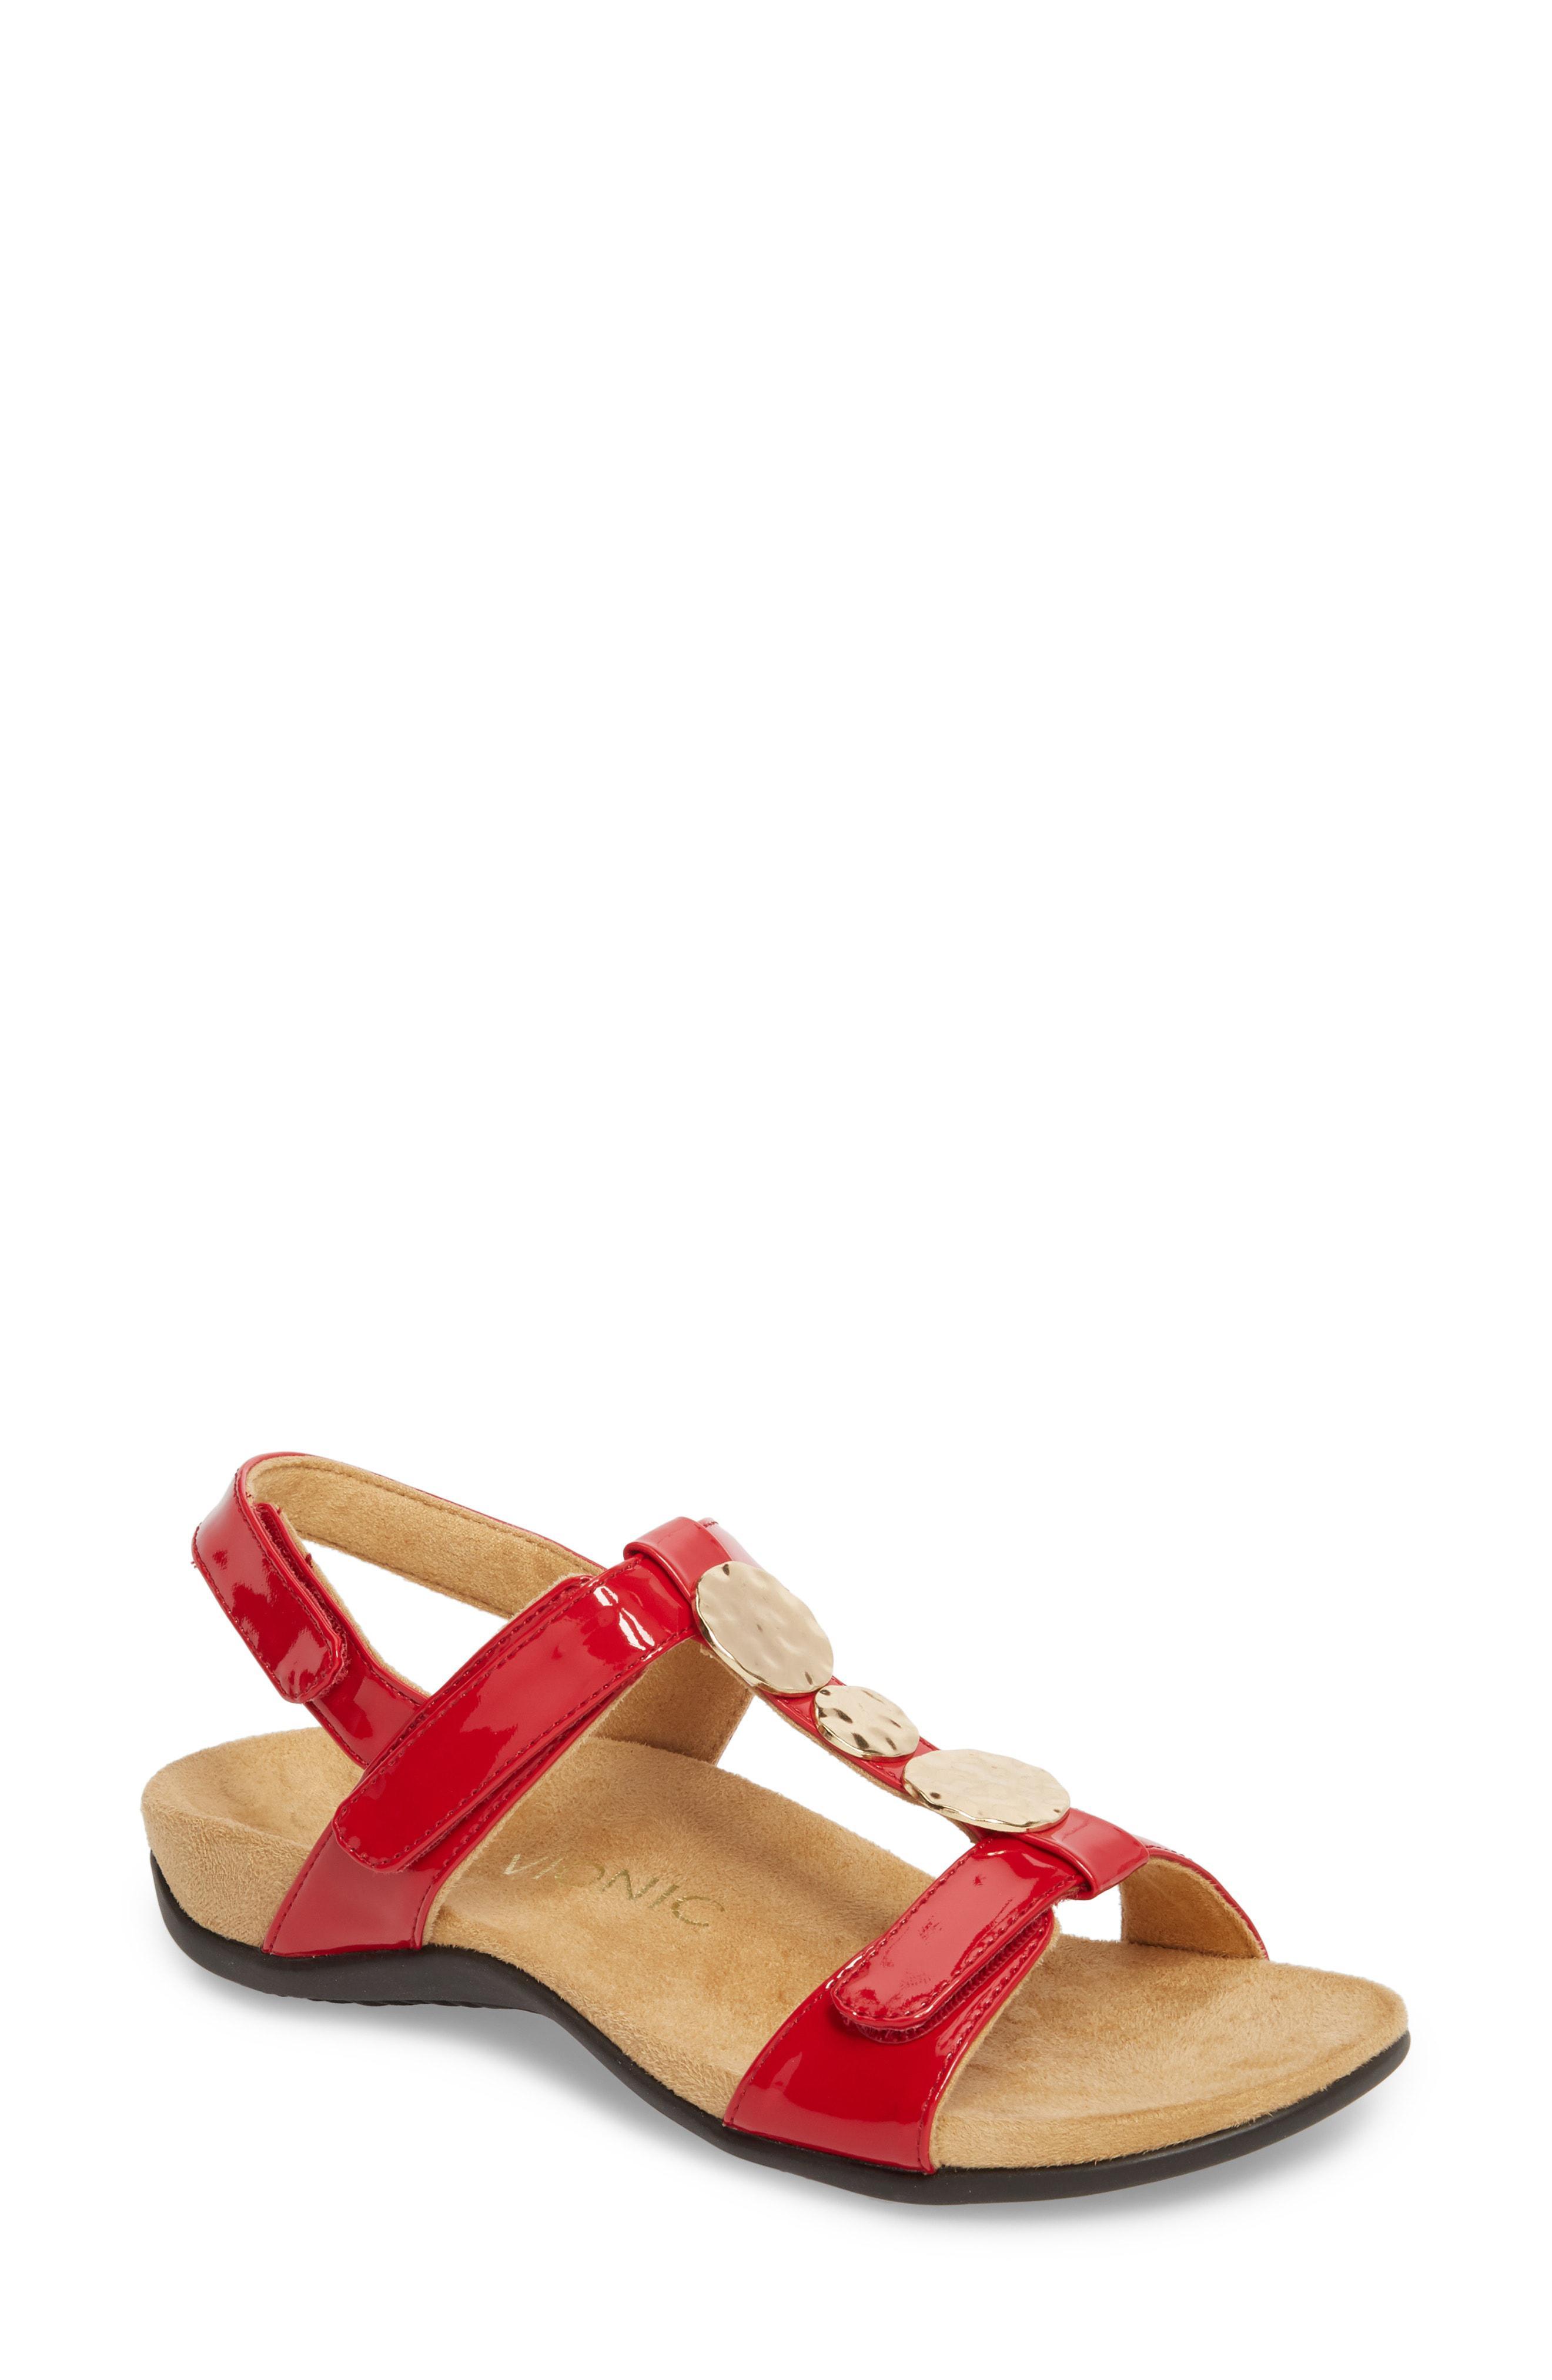 d9c6d0b0e7c0 Vionic Farra Orthaheel Sandal in Red - Lyst